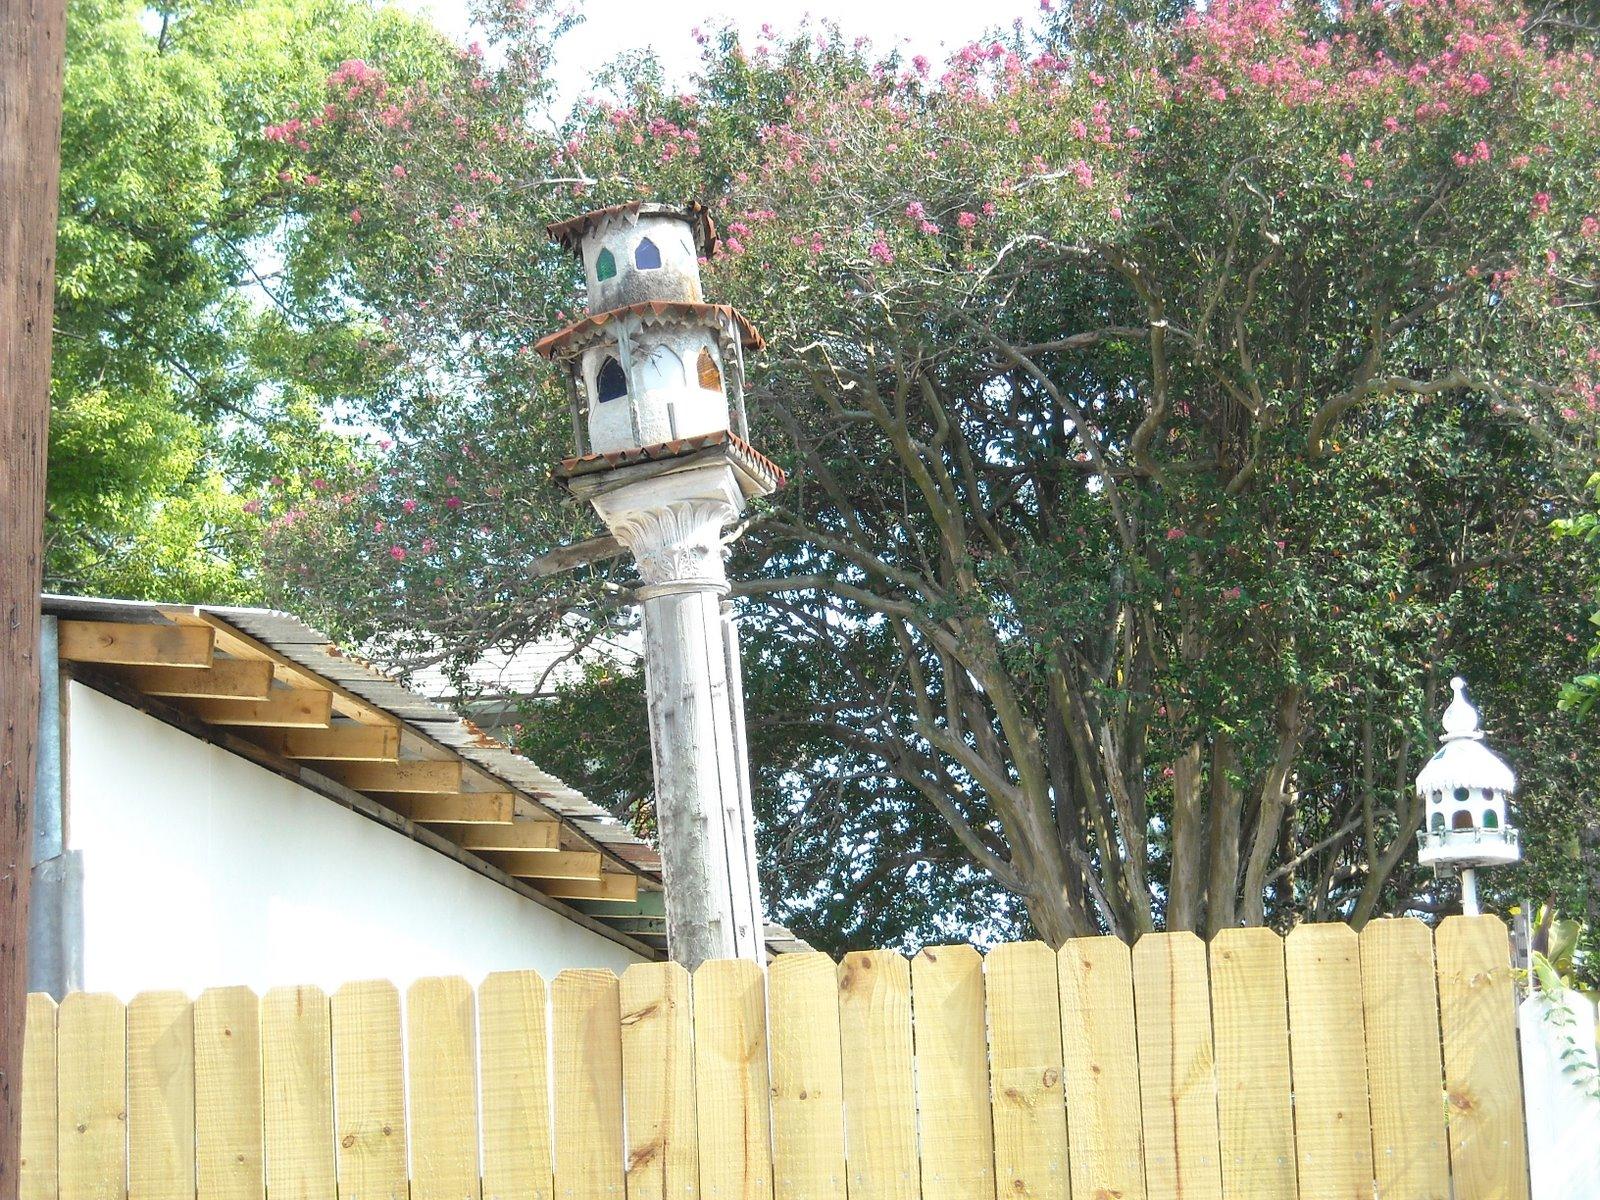 Birdhouse, NOLA-Style